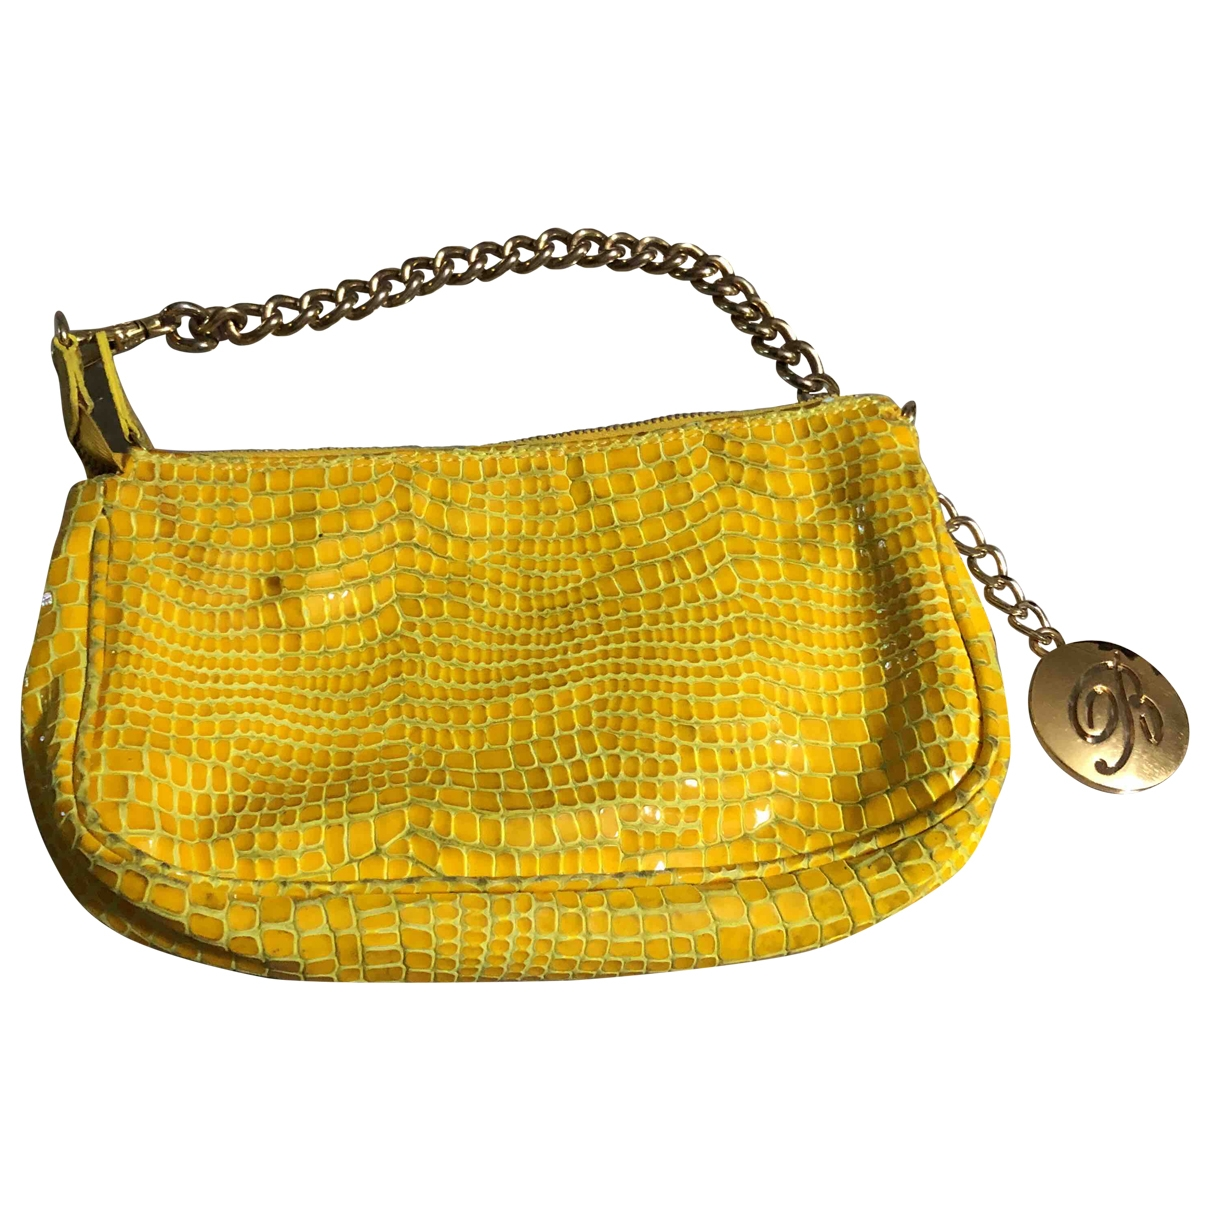 Blumarine \N Yellow Patent leather handbag for Women \N